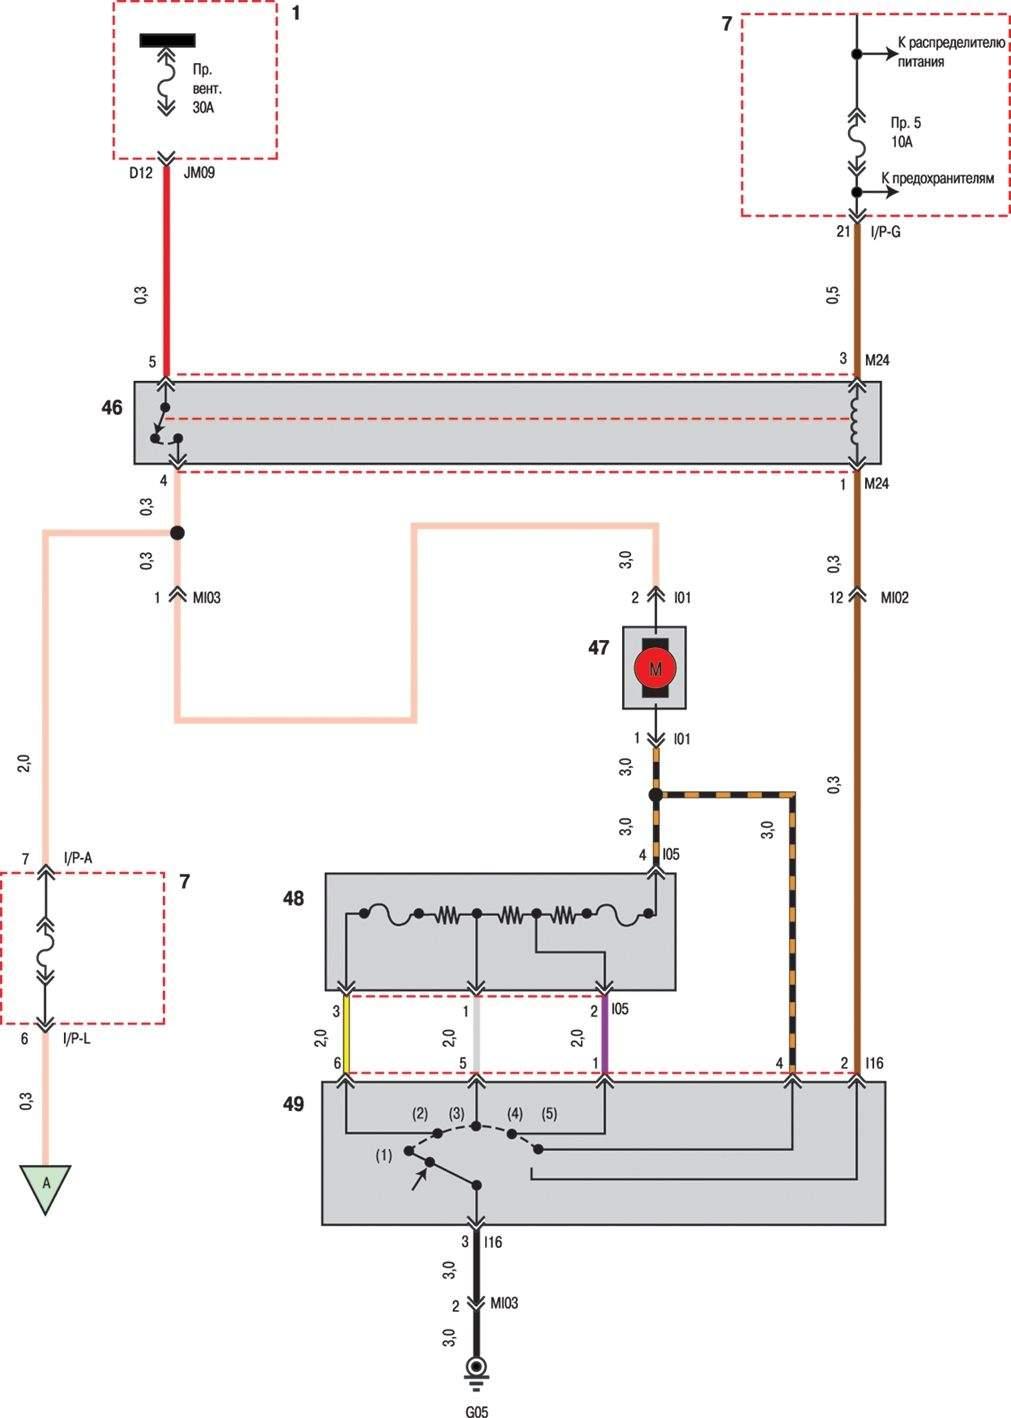 Схема электрооборудования хендай соната фото 381